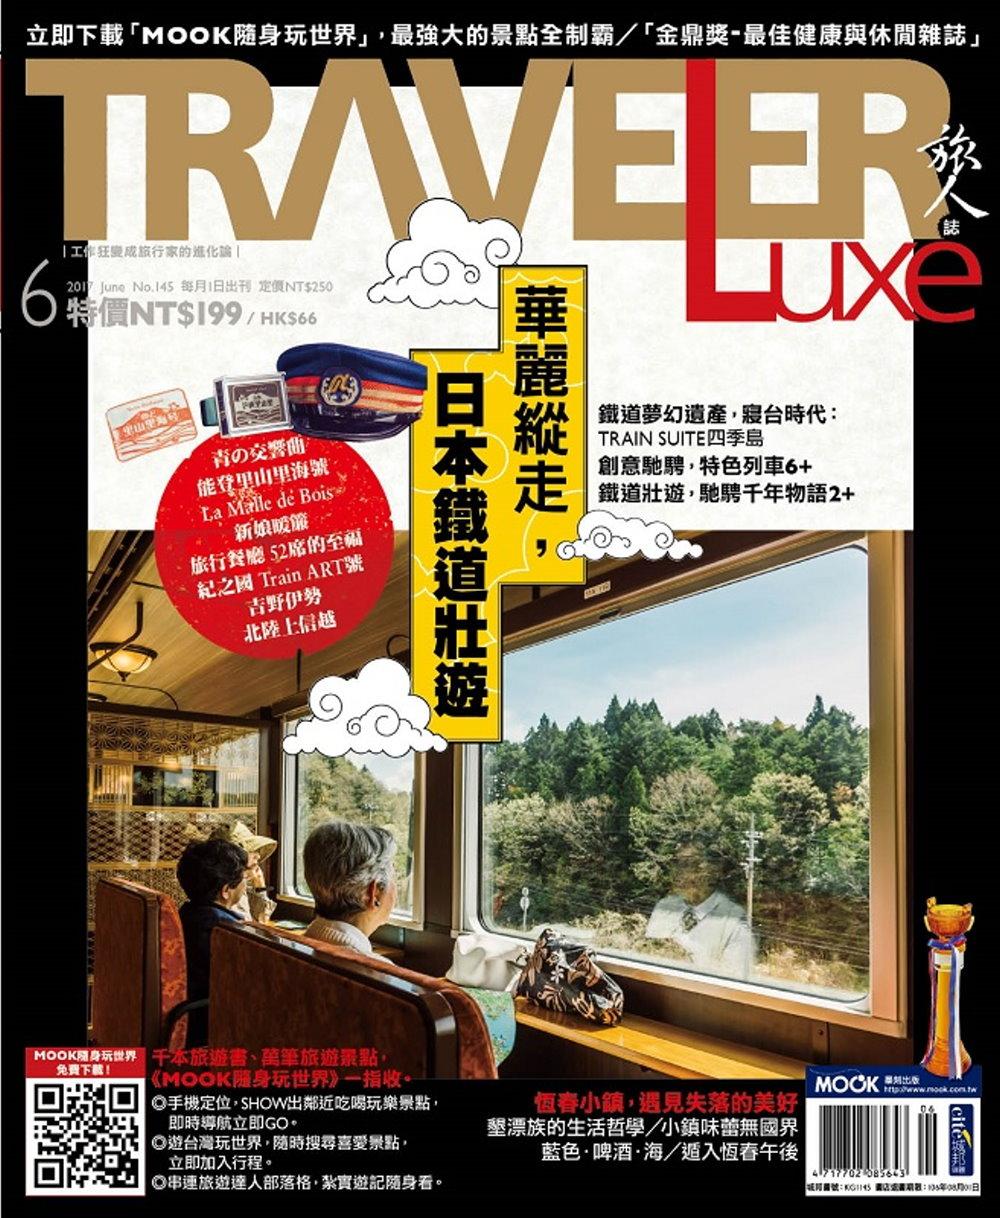 TRAVELER LUXE 旅人誌 6月號/2017 第145期